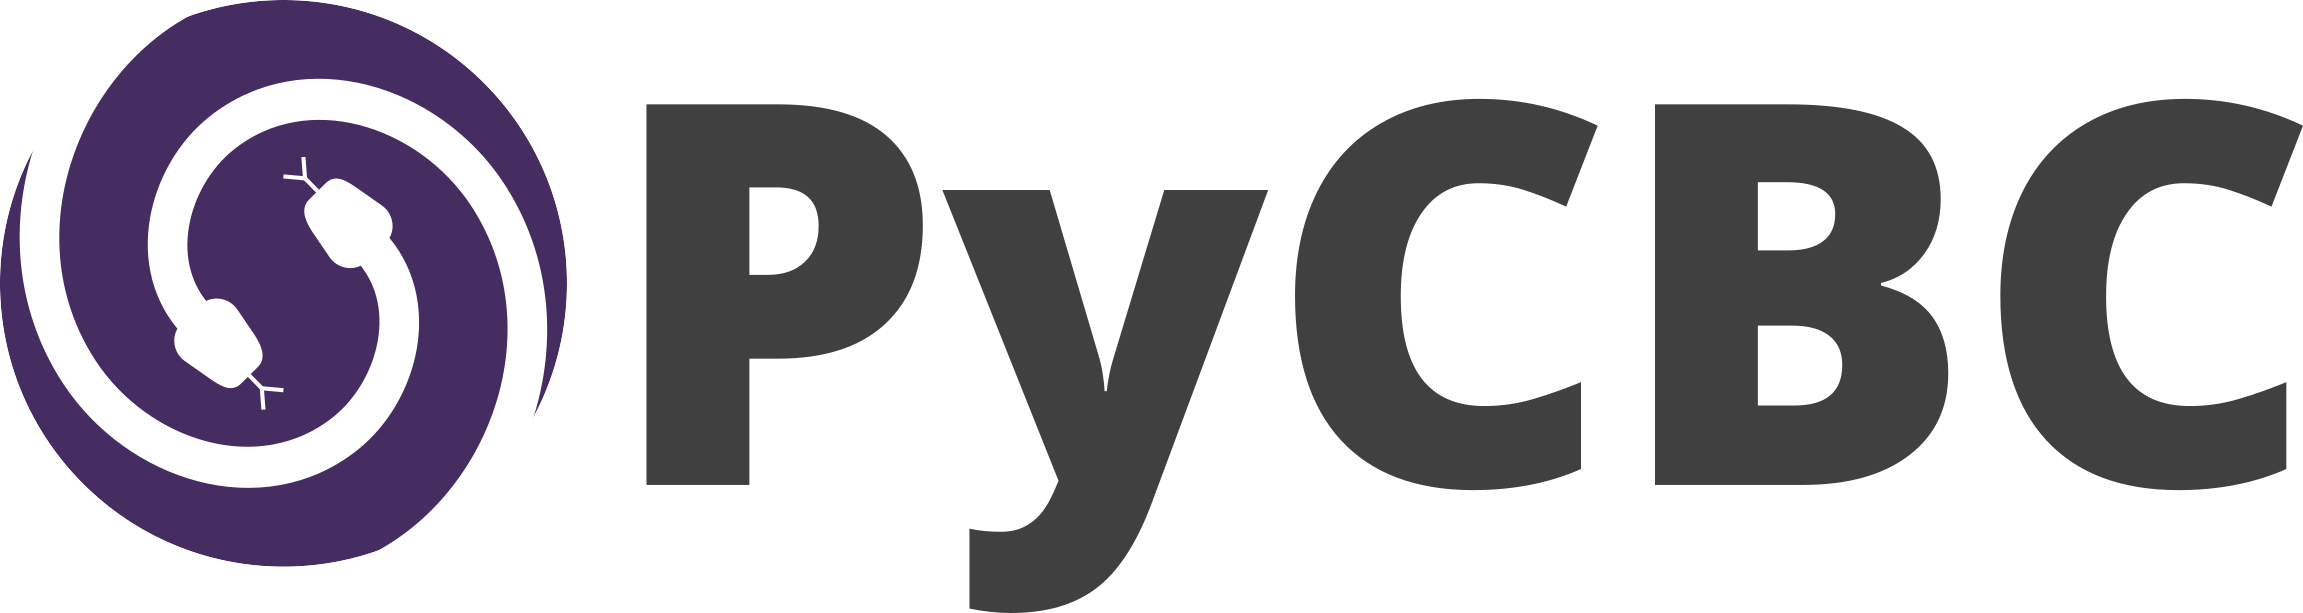 PyCBC logo